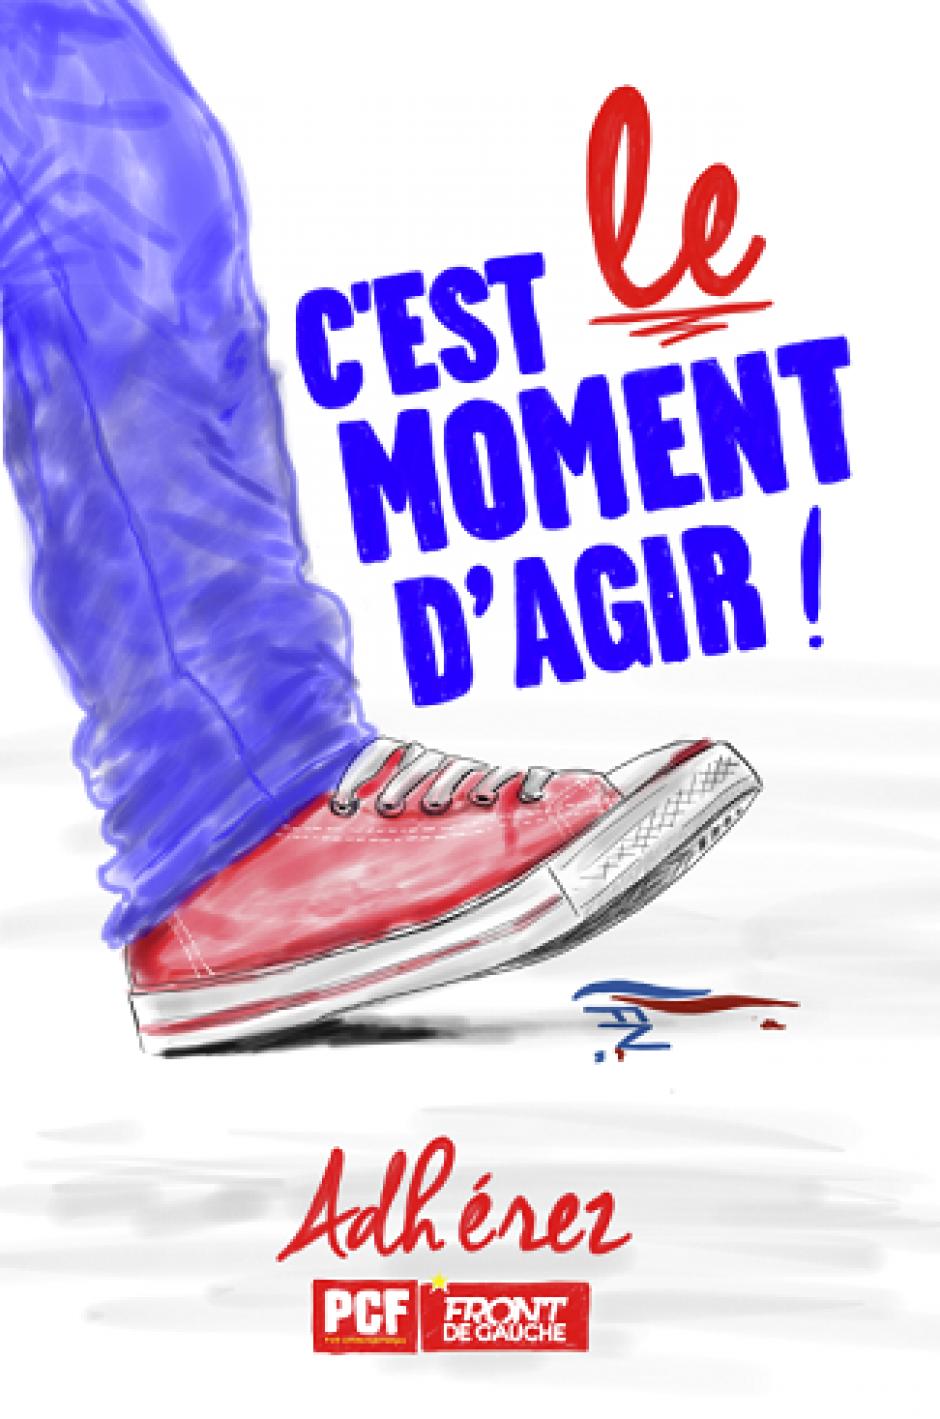 Limoges Bleu Marine: ultra réac' ou extrême réac'?